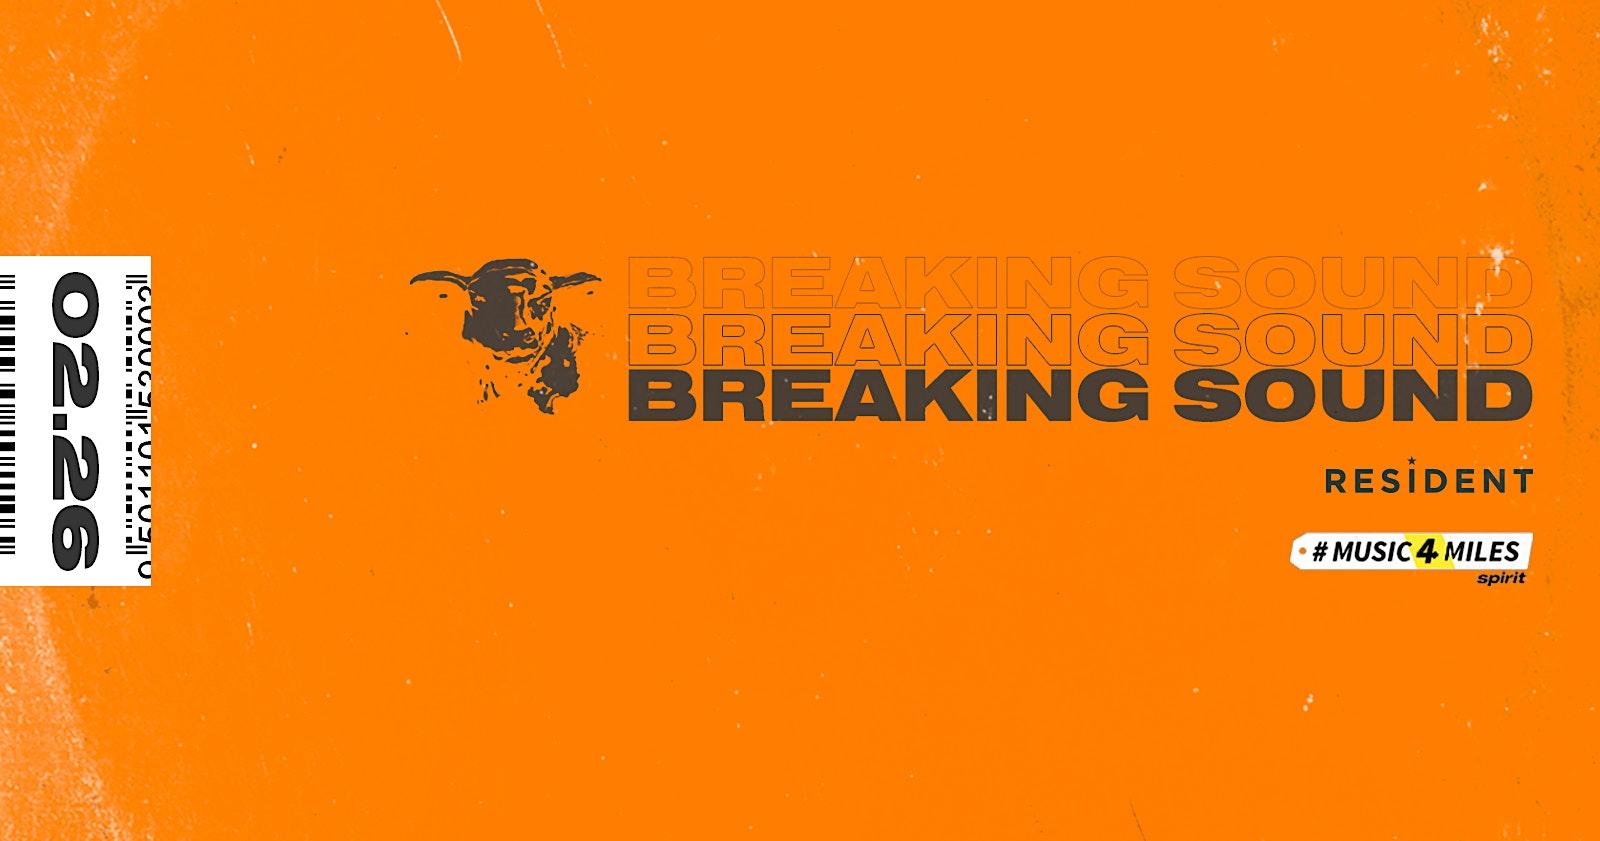 Breaking Sound Ft. The Sway, Ren Farren, Rowan Katz, Maddie Ross